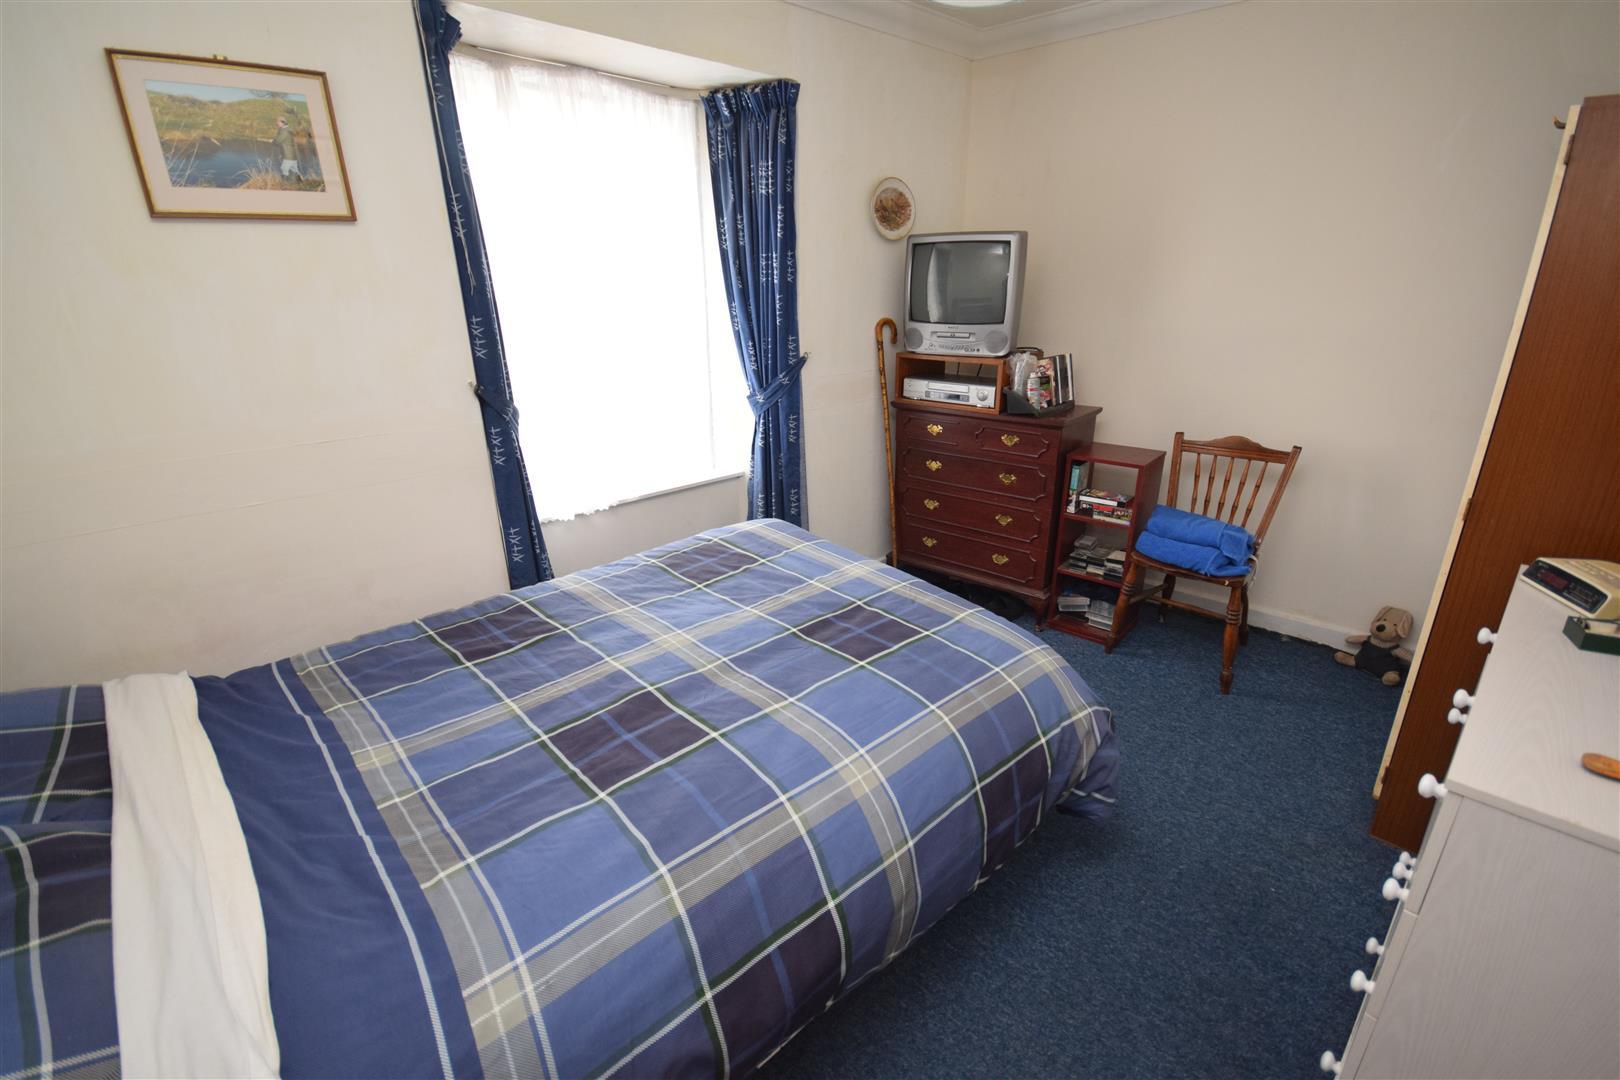 40, Townhead, Perthshire, PH3 1AH, UK